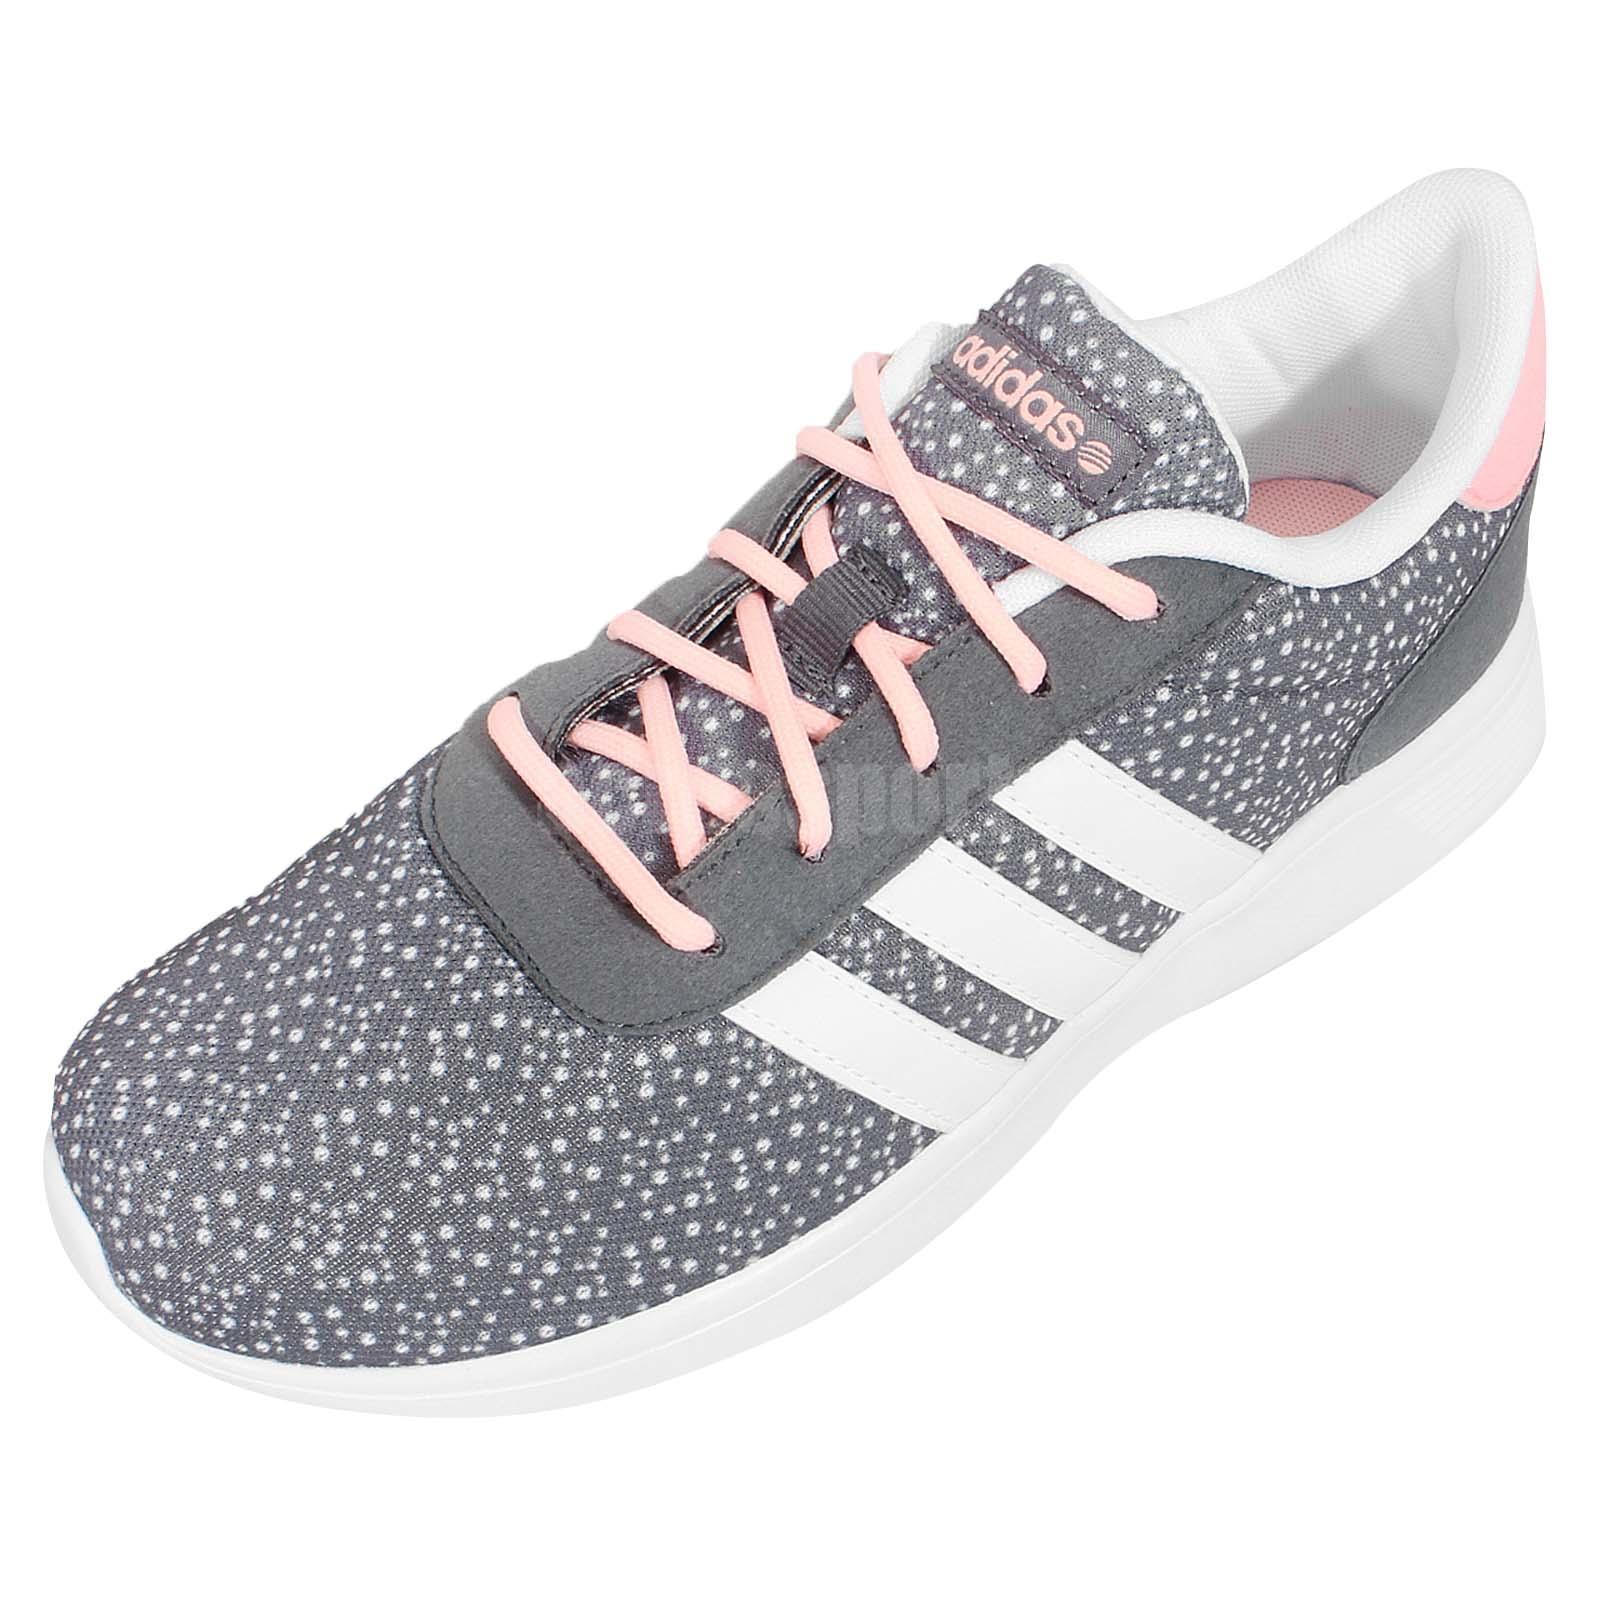 Adidas Neo Grey Pink